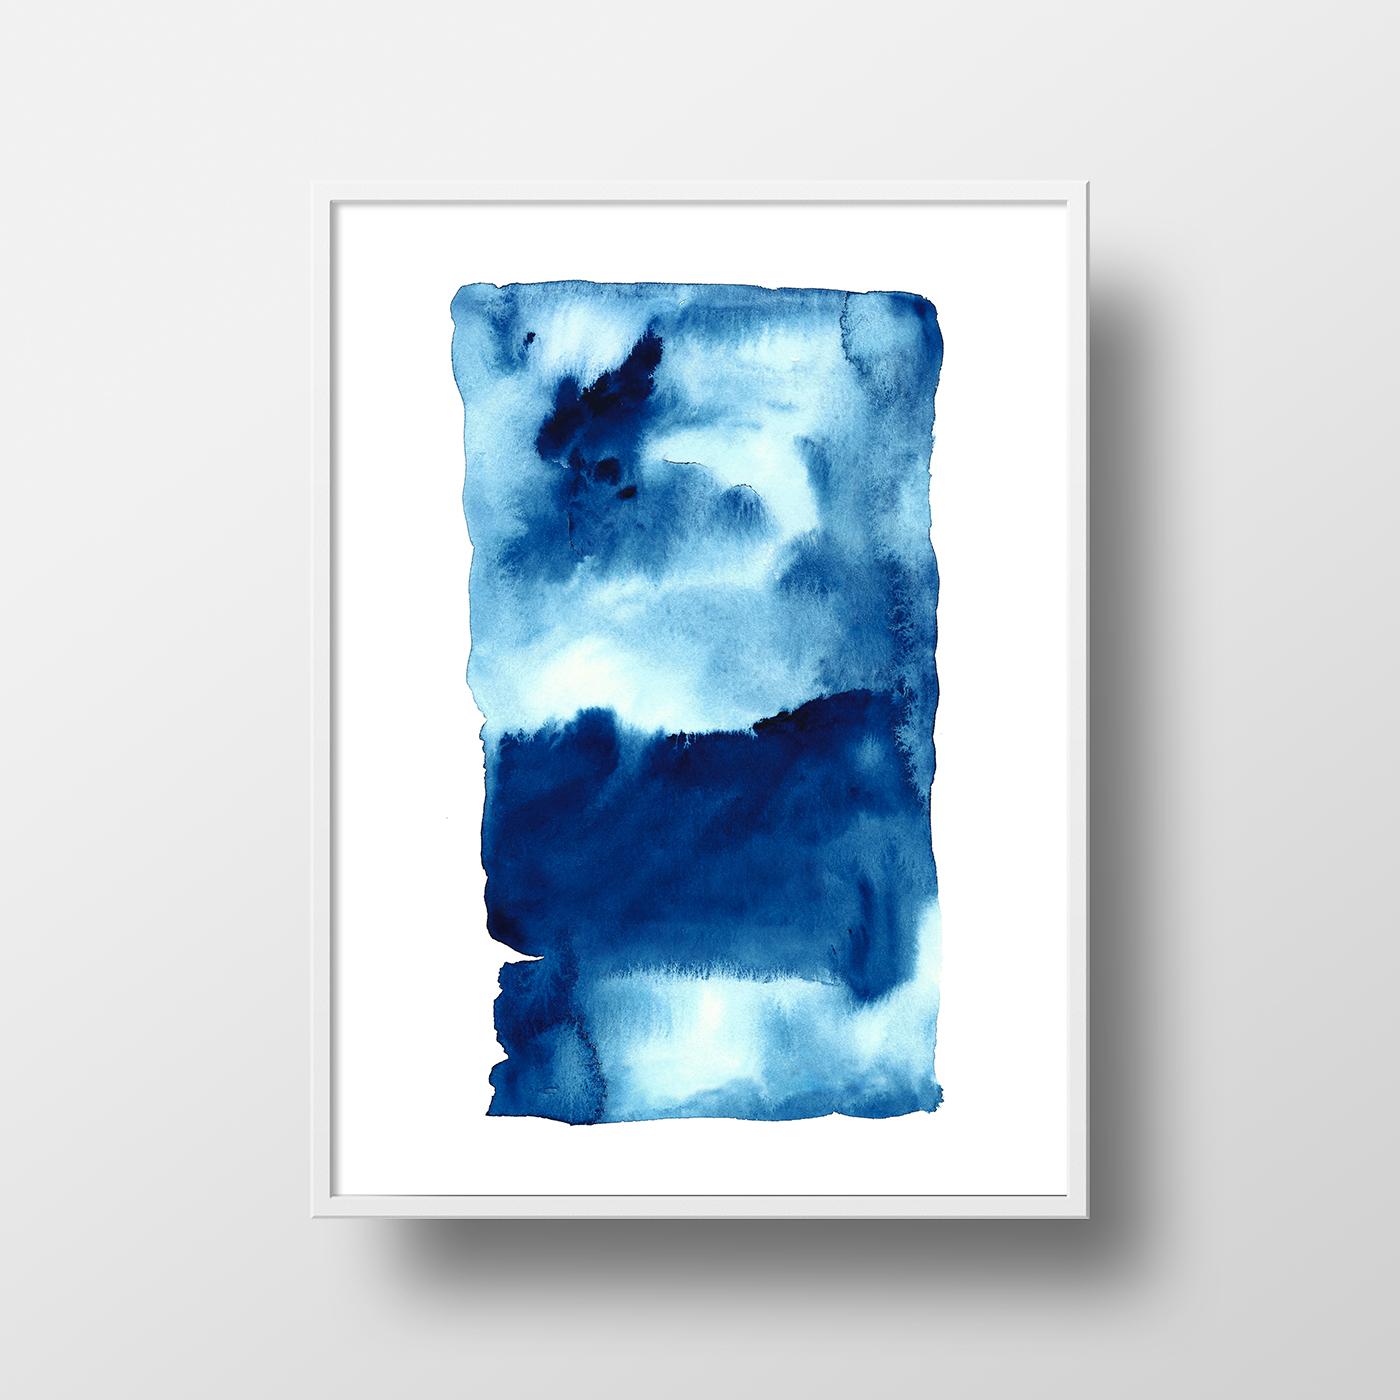 minted-challenge-minted-x-west-elm-belia-simm-storm-1.jpg